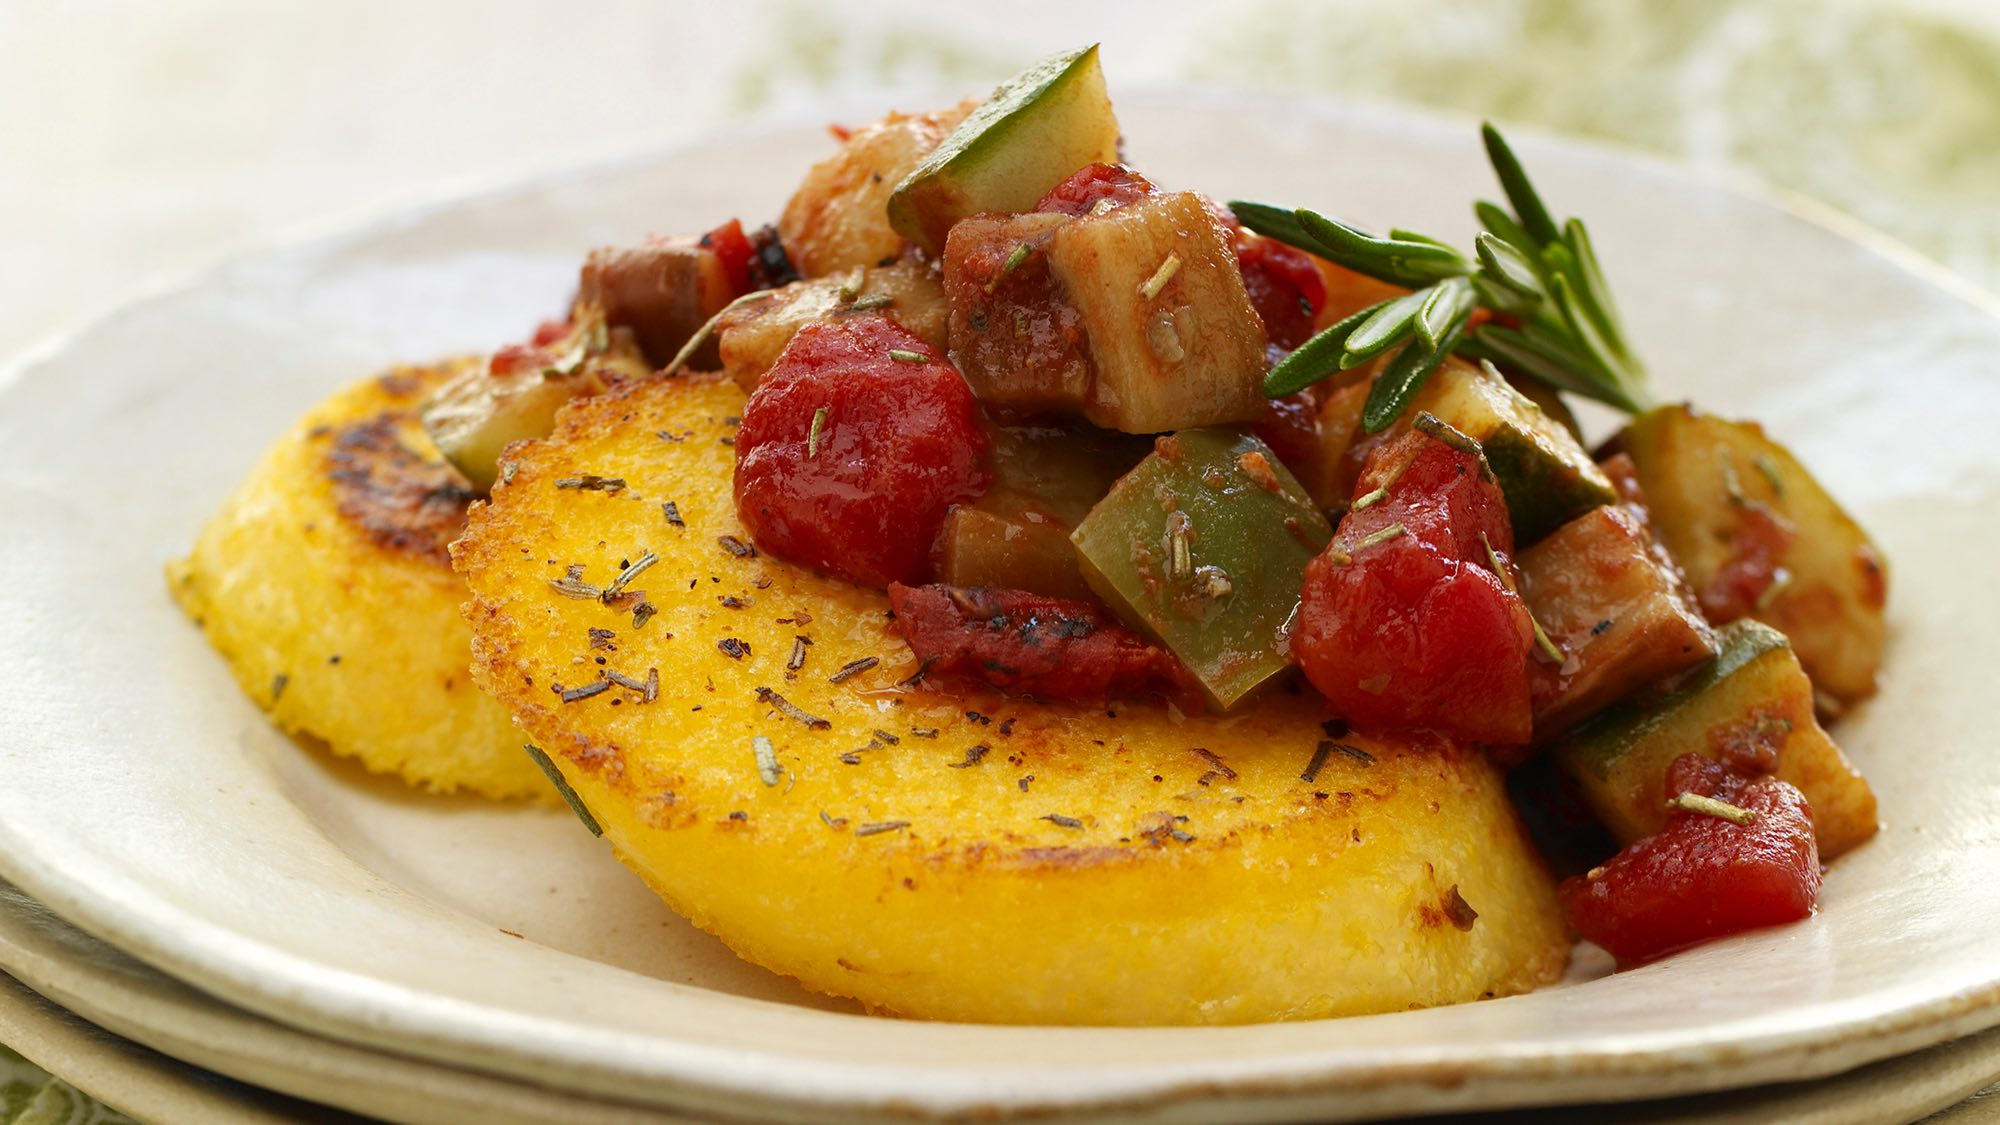 garden-ratatouille-with-crispy-rosemary-polenta.jpg